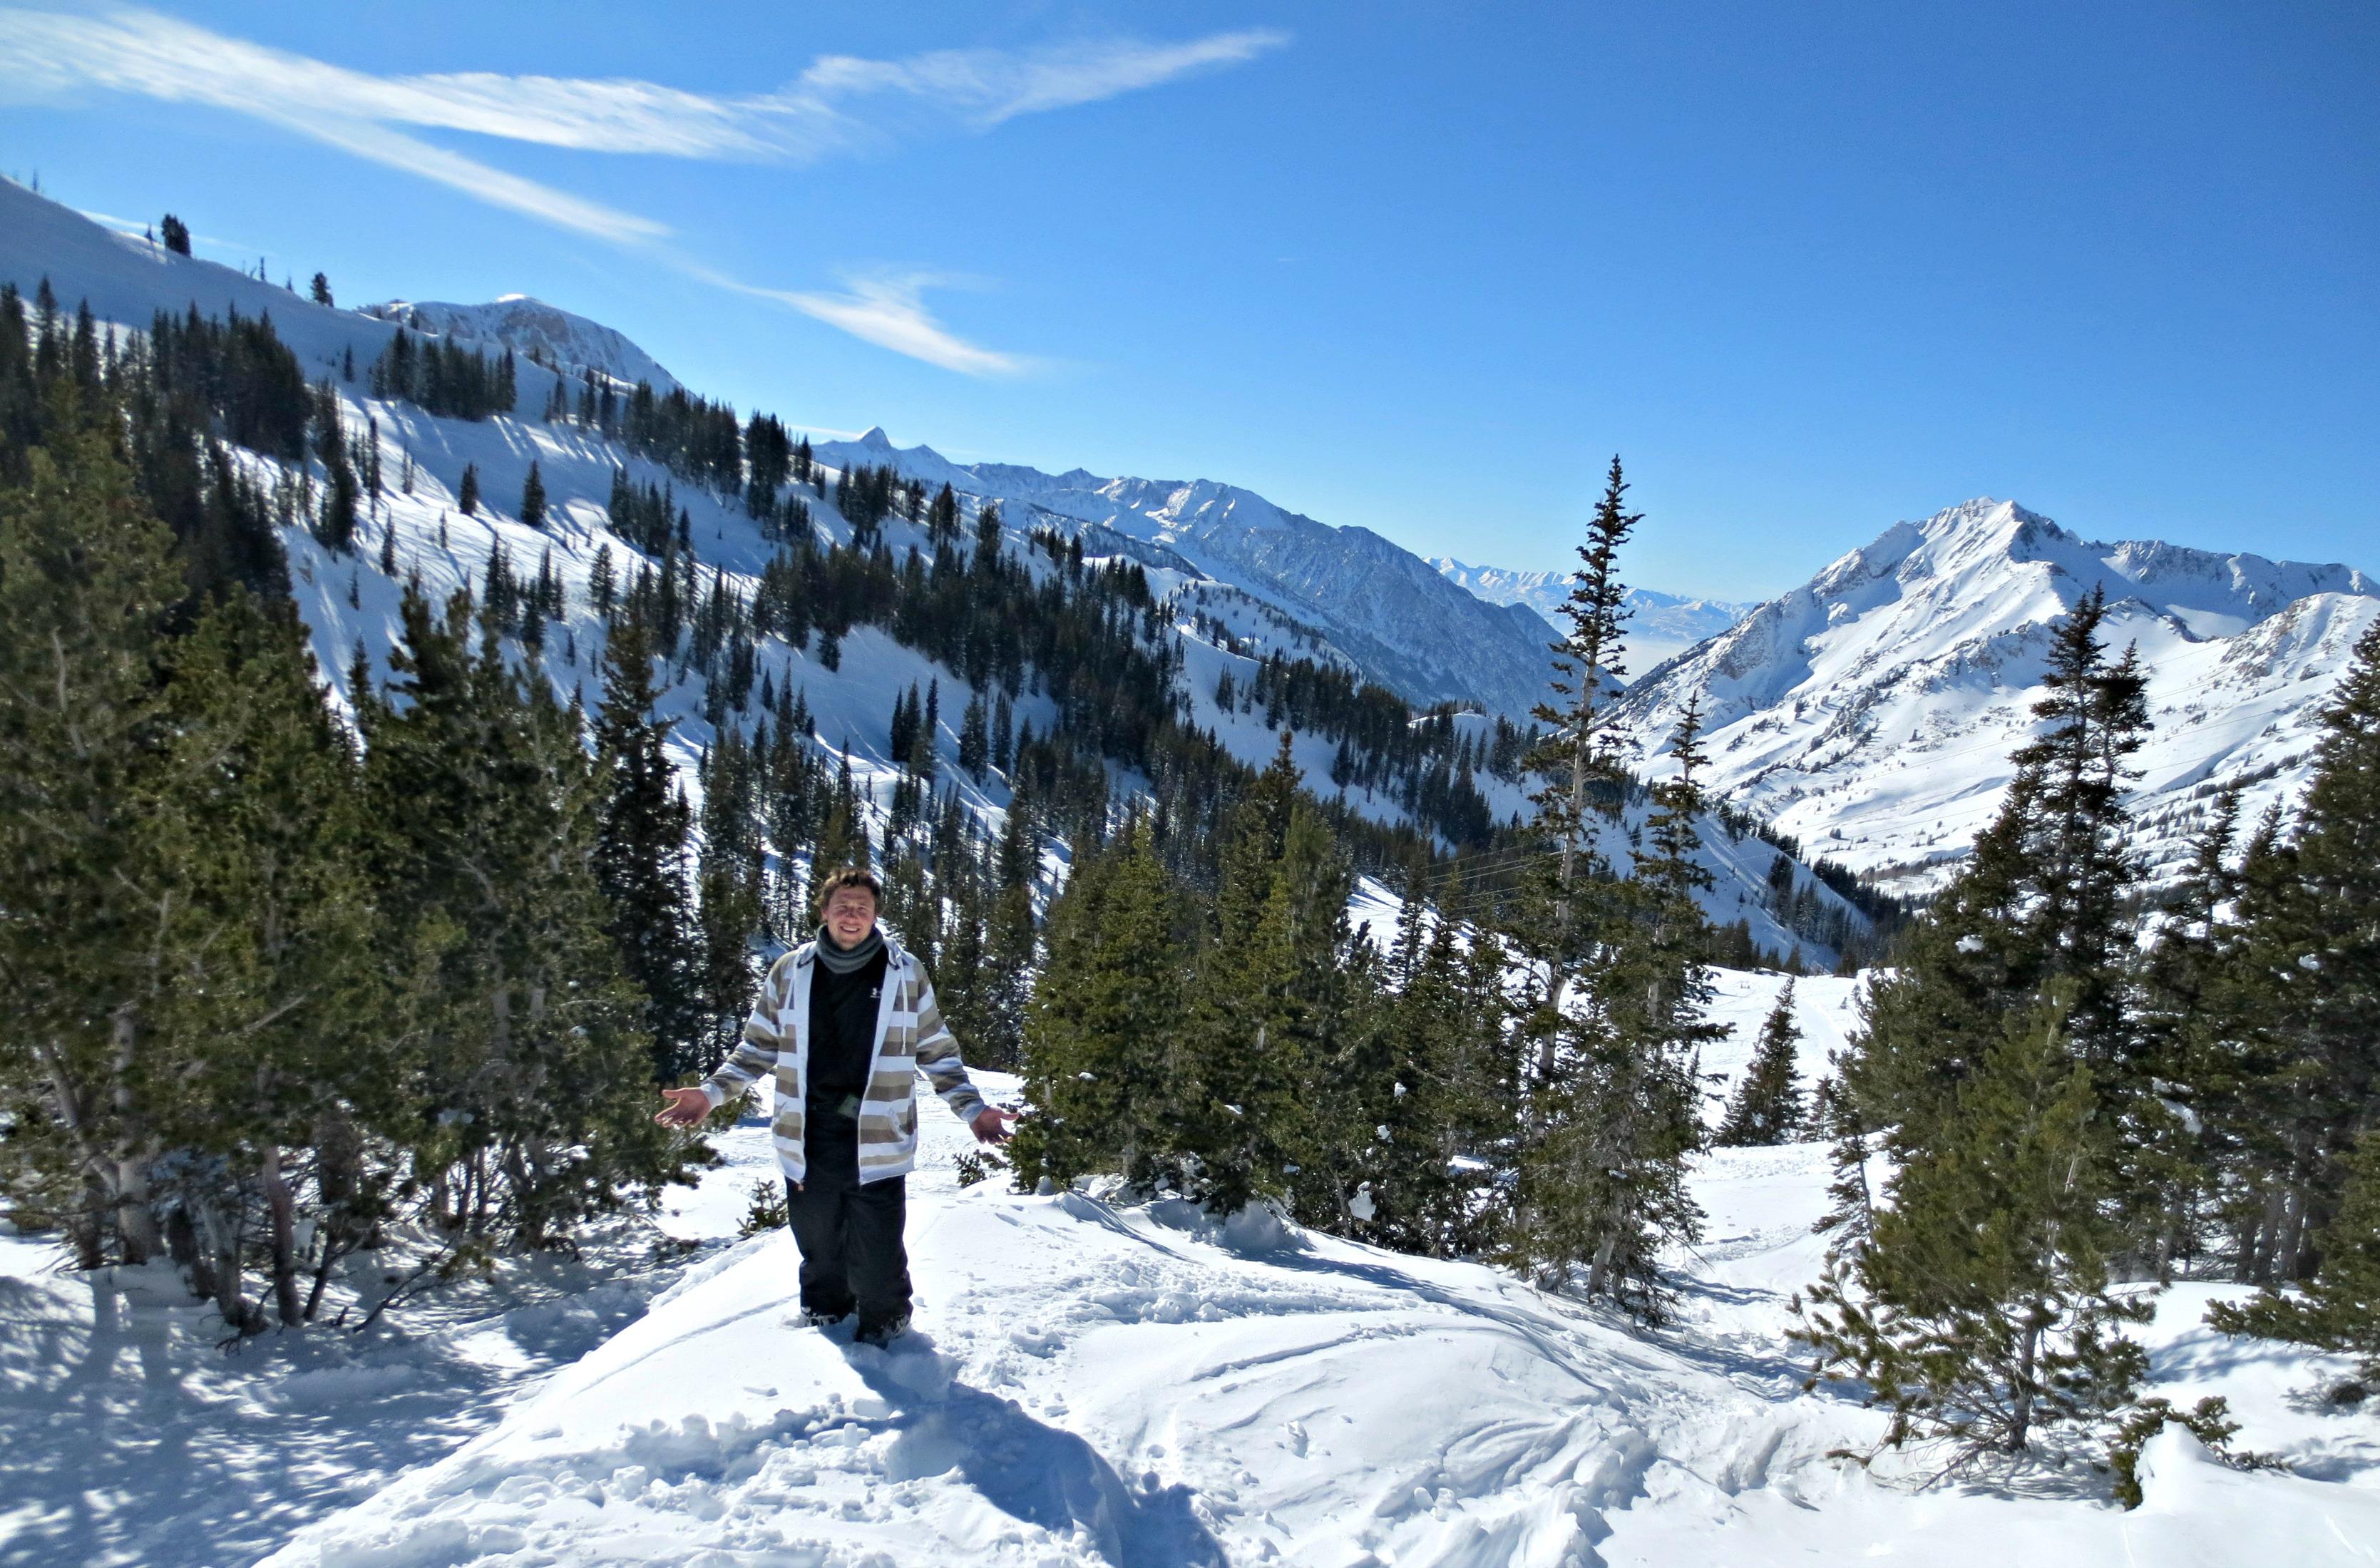 Soaking Up The Scenery On The Slopes Of Salt Lake Photos